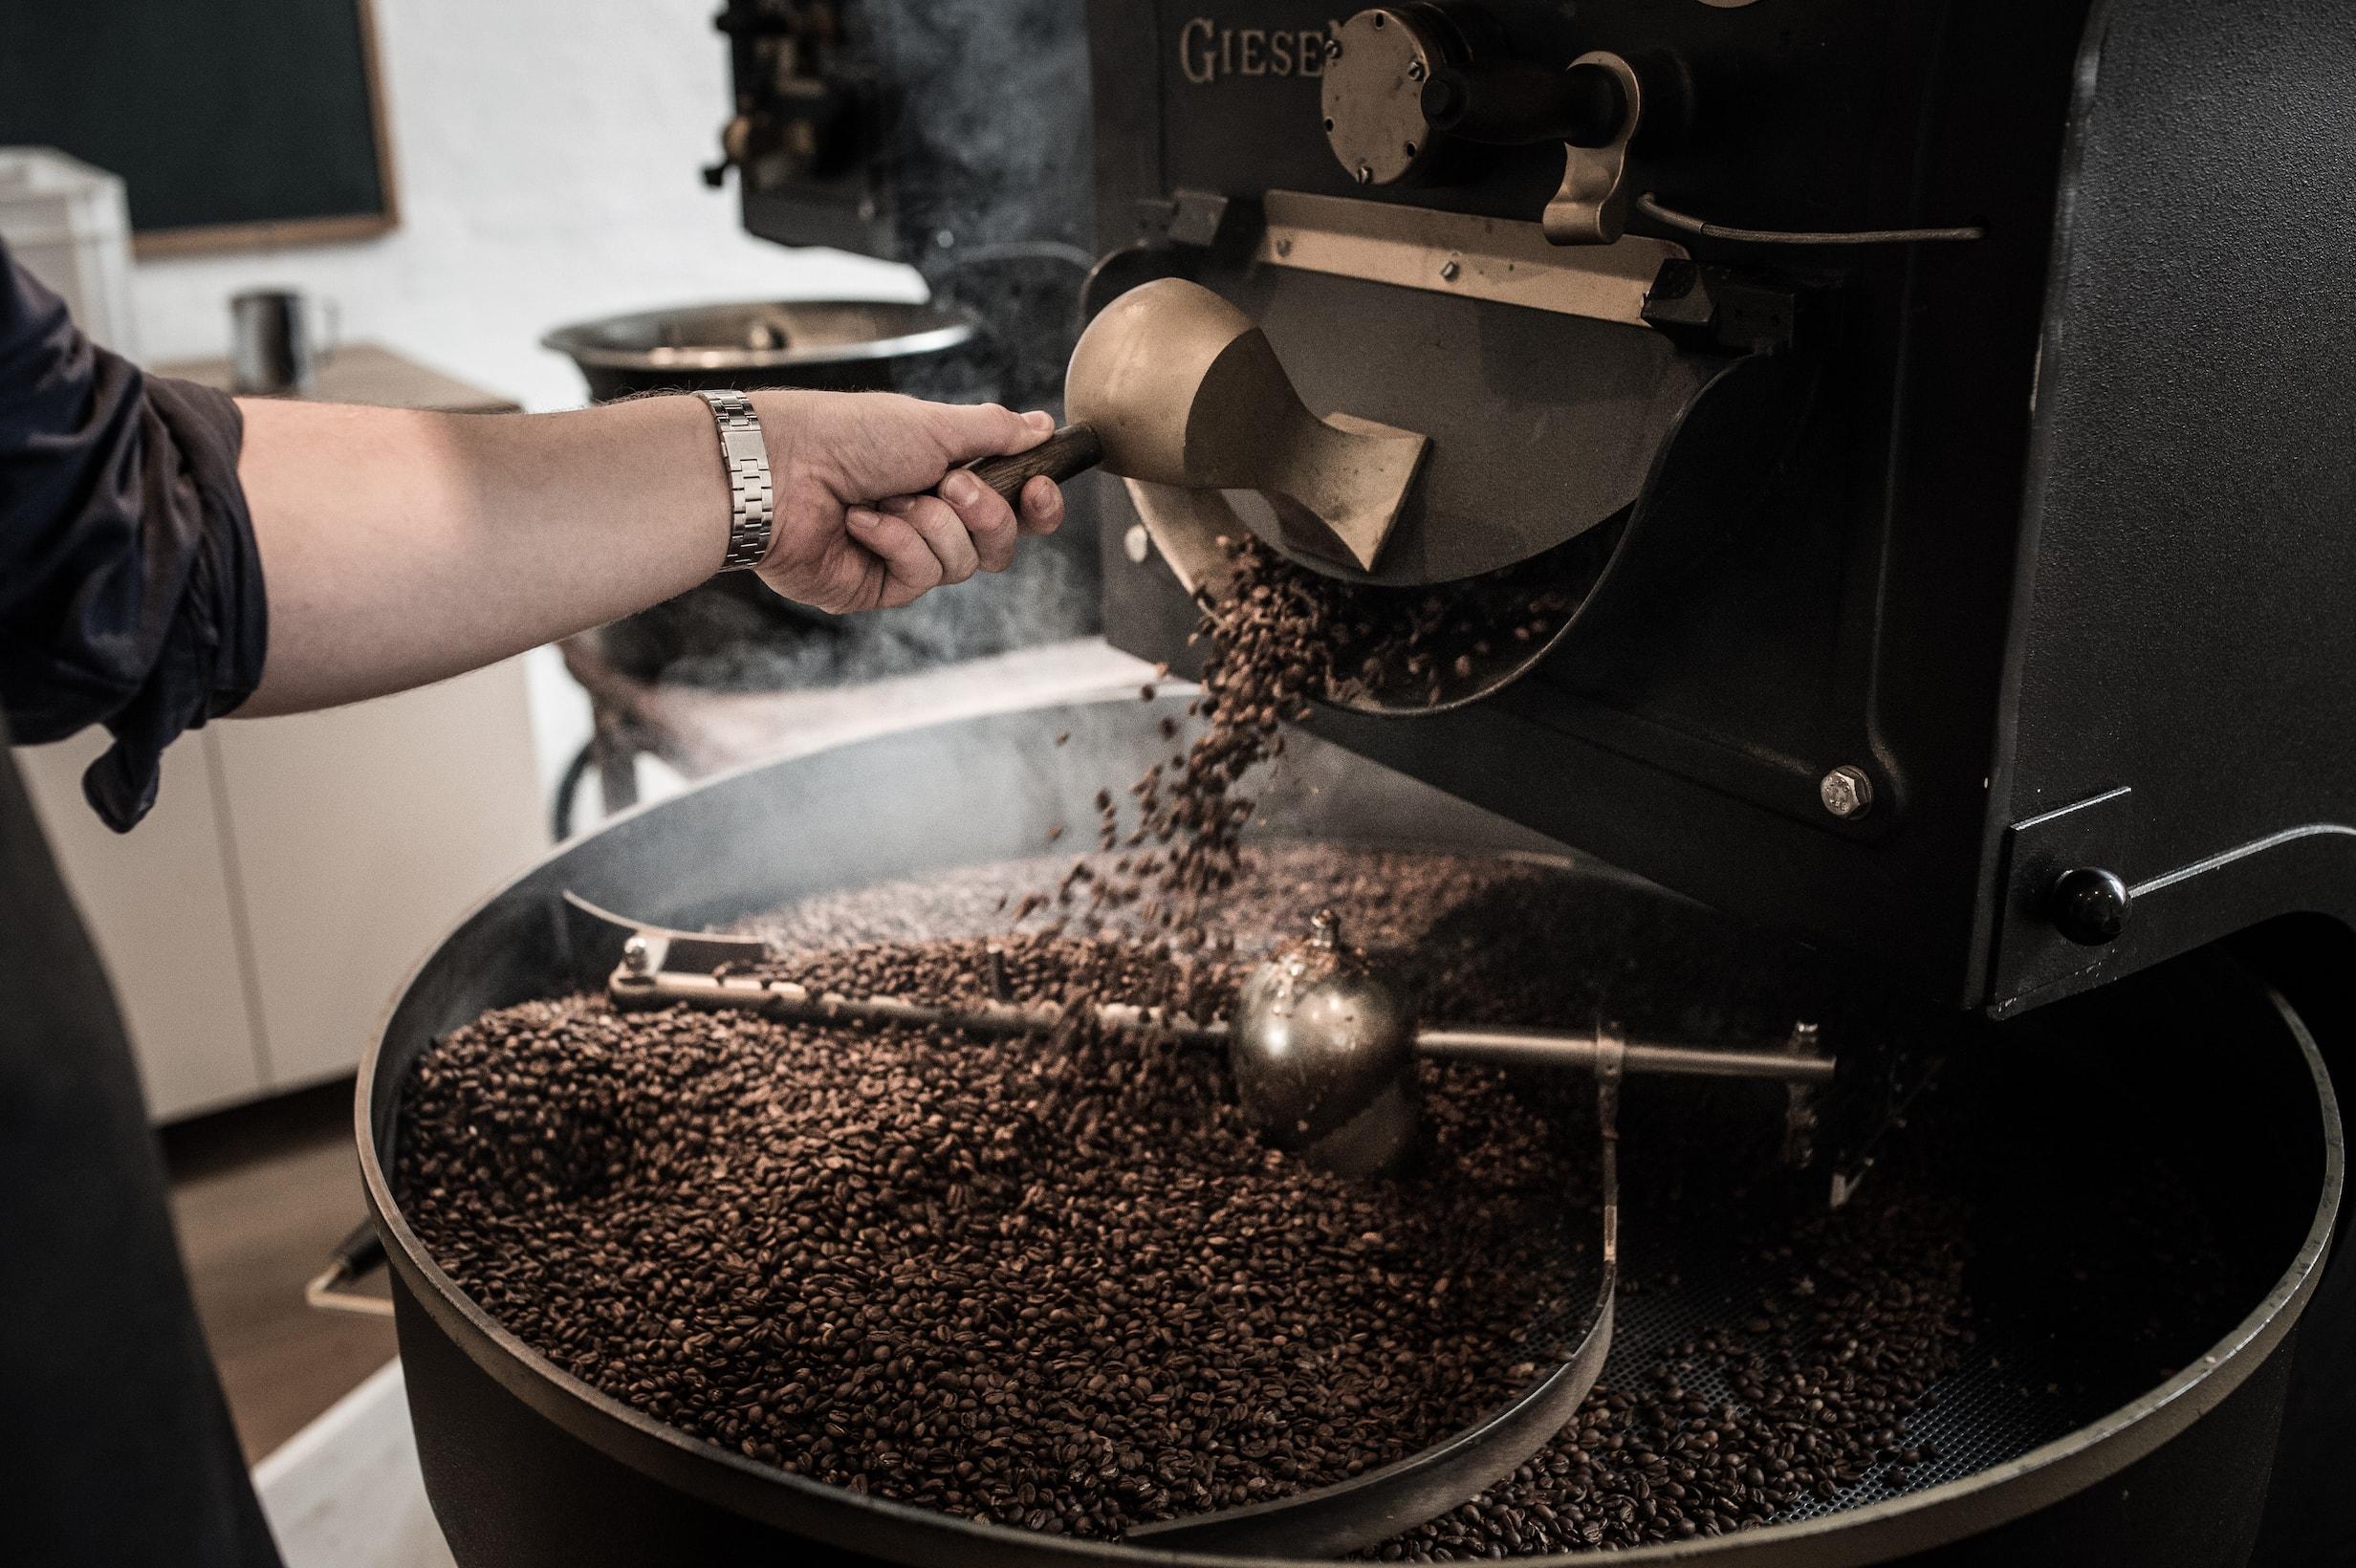 Copenhagen Coffee Lab roasting on a Giesen